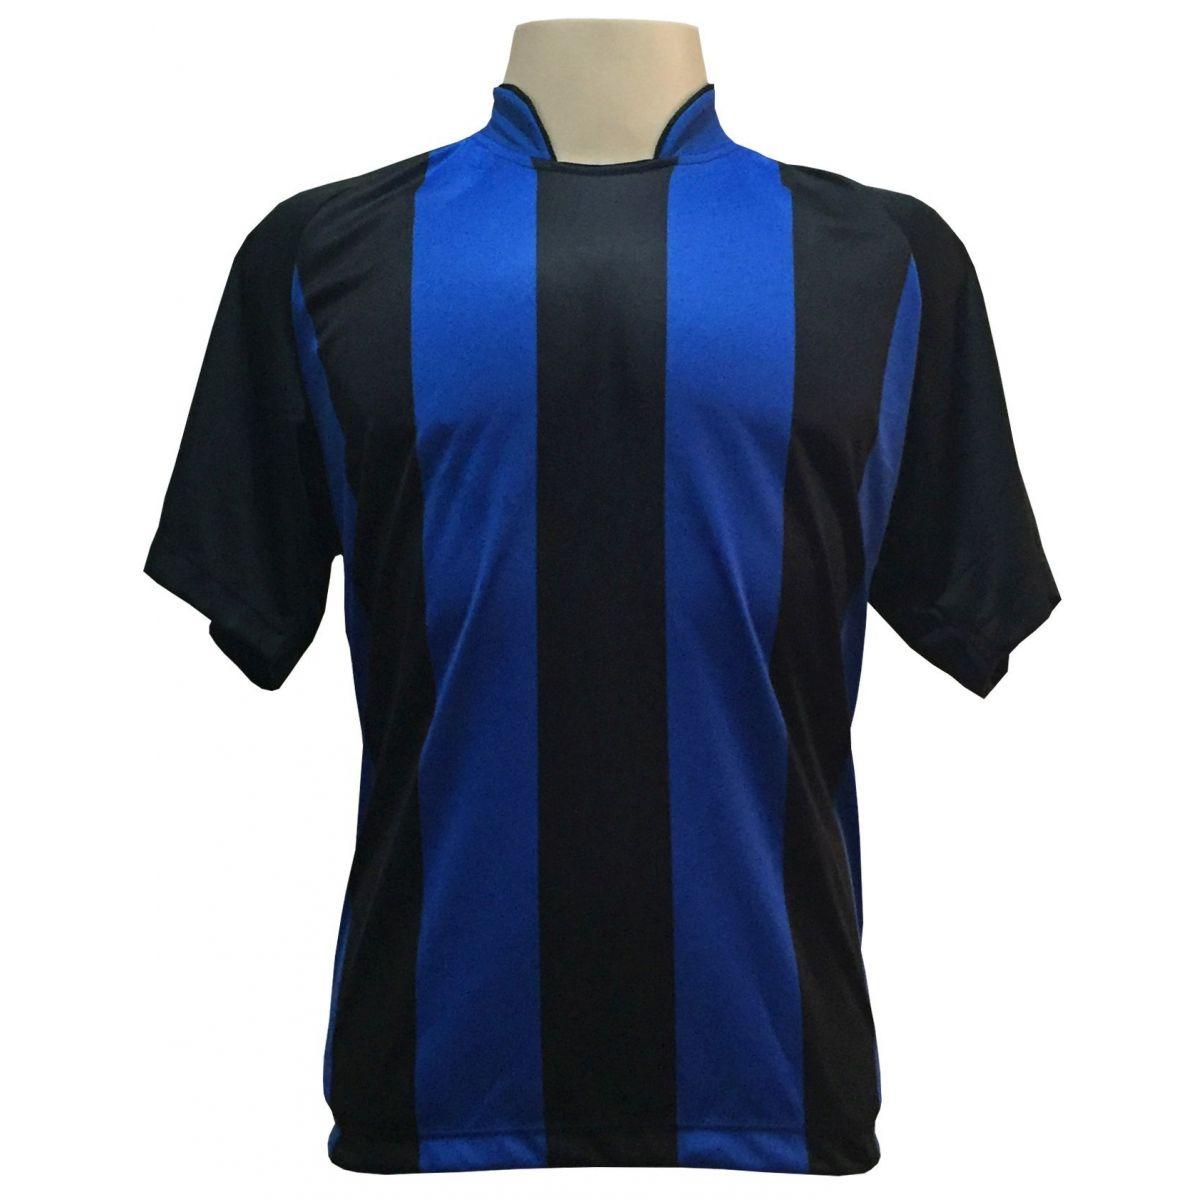 Jogo de Camisa com 12 unidades modelo Milan Preto/Royal + Brindes